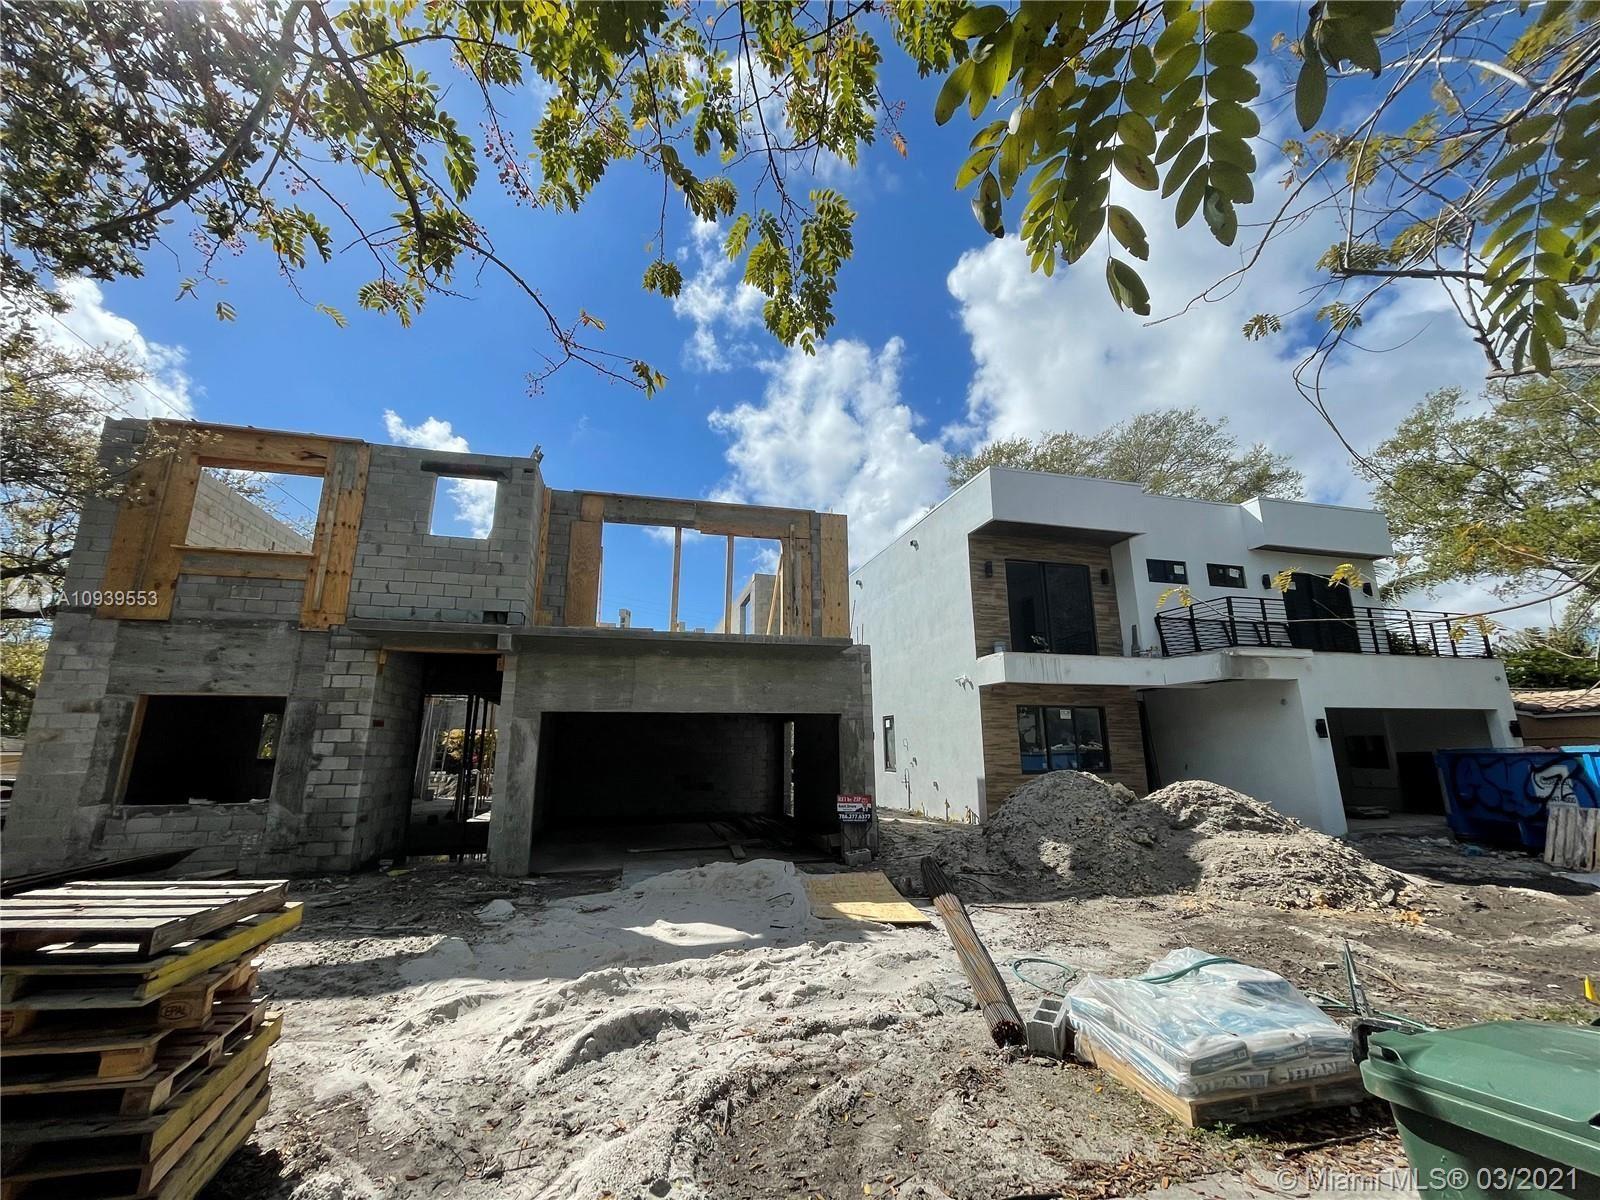 409 NE 17th Ave, Fort Lauderdale, FL 33301 - #: A10939553